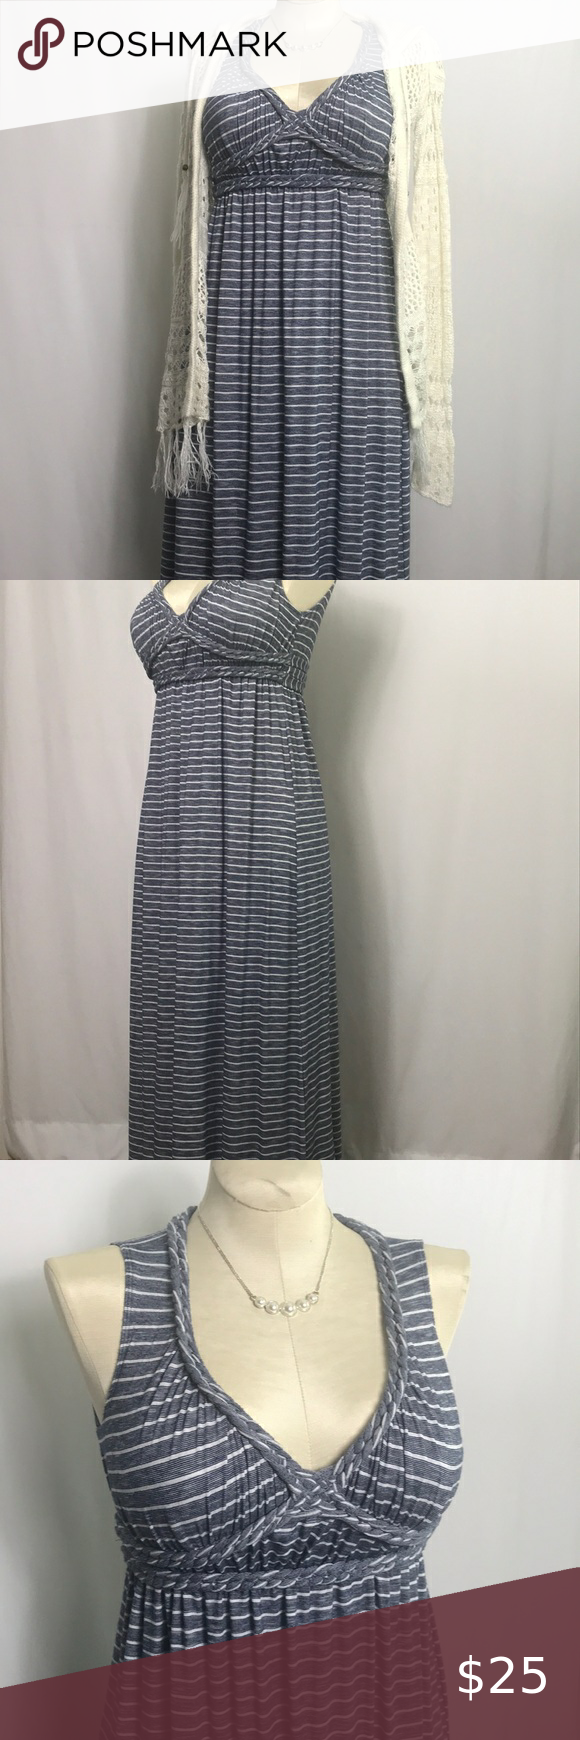 Max Studio Couper Striped Casual Maxi Dress In 2020 Maxi Dresses Casual Maxi Dress Max Studio Dress [ 1740 x 580 Pixel ]